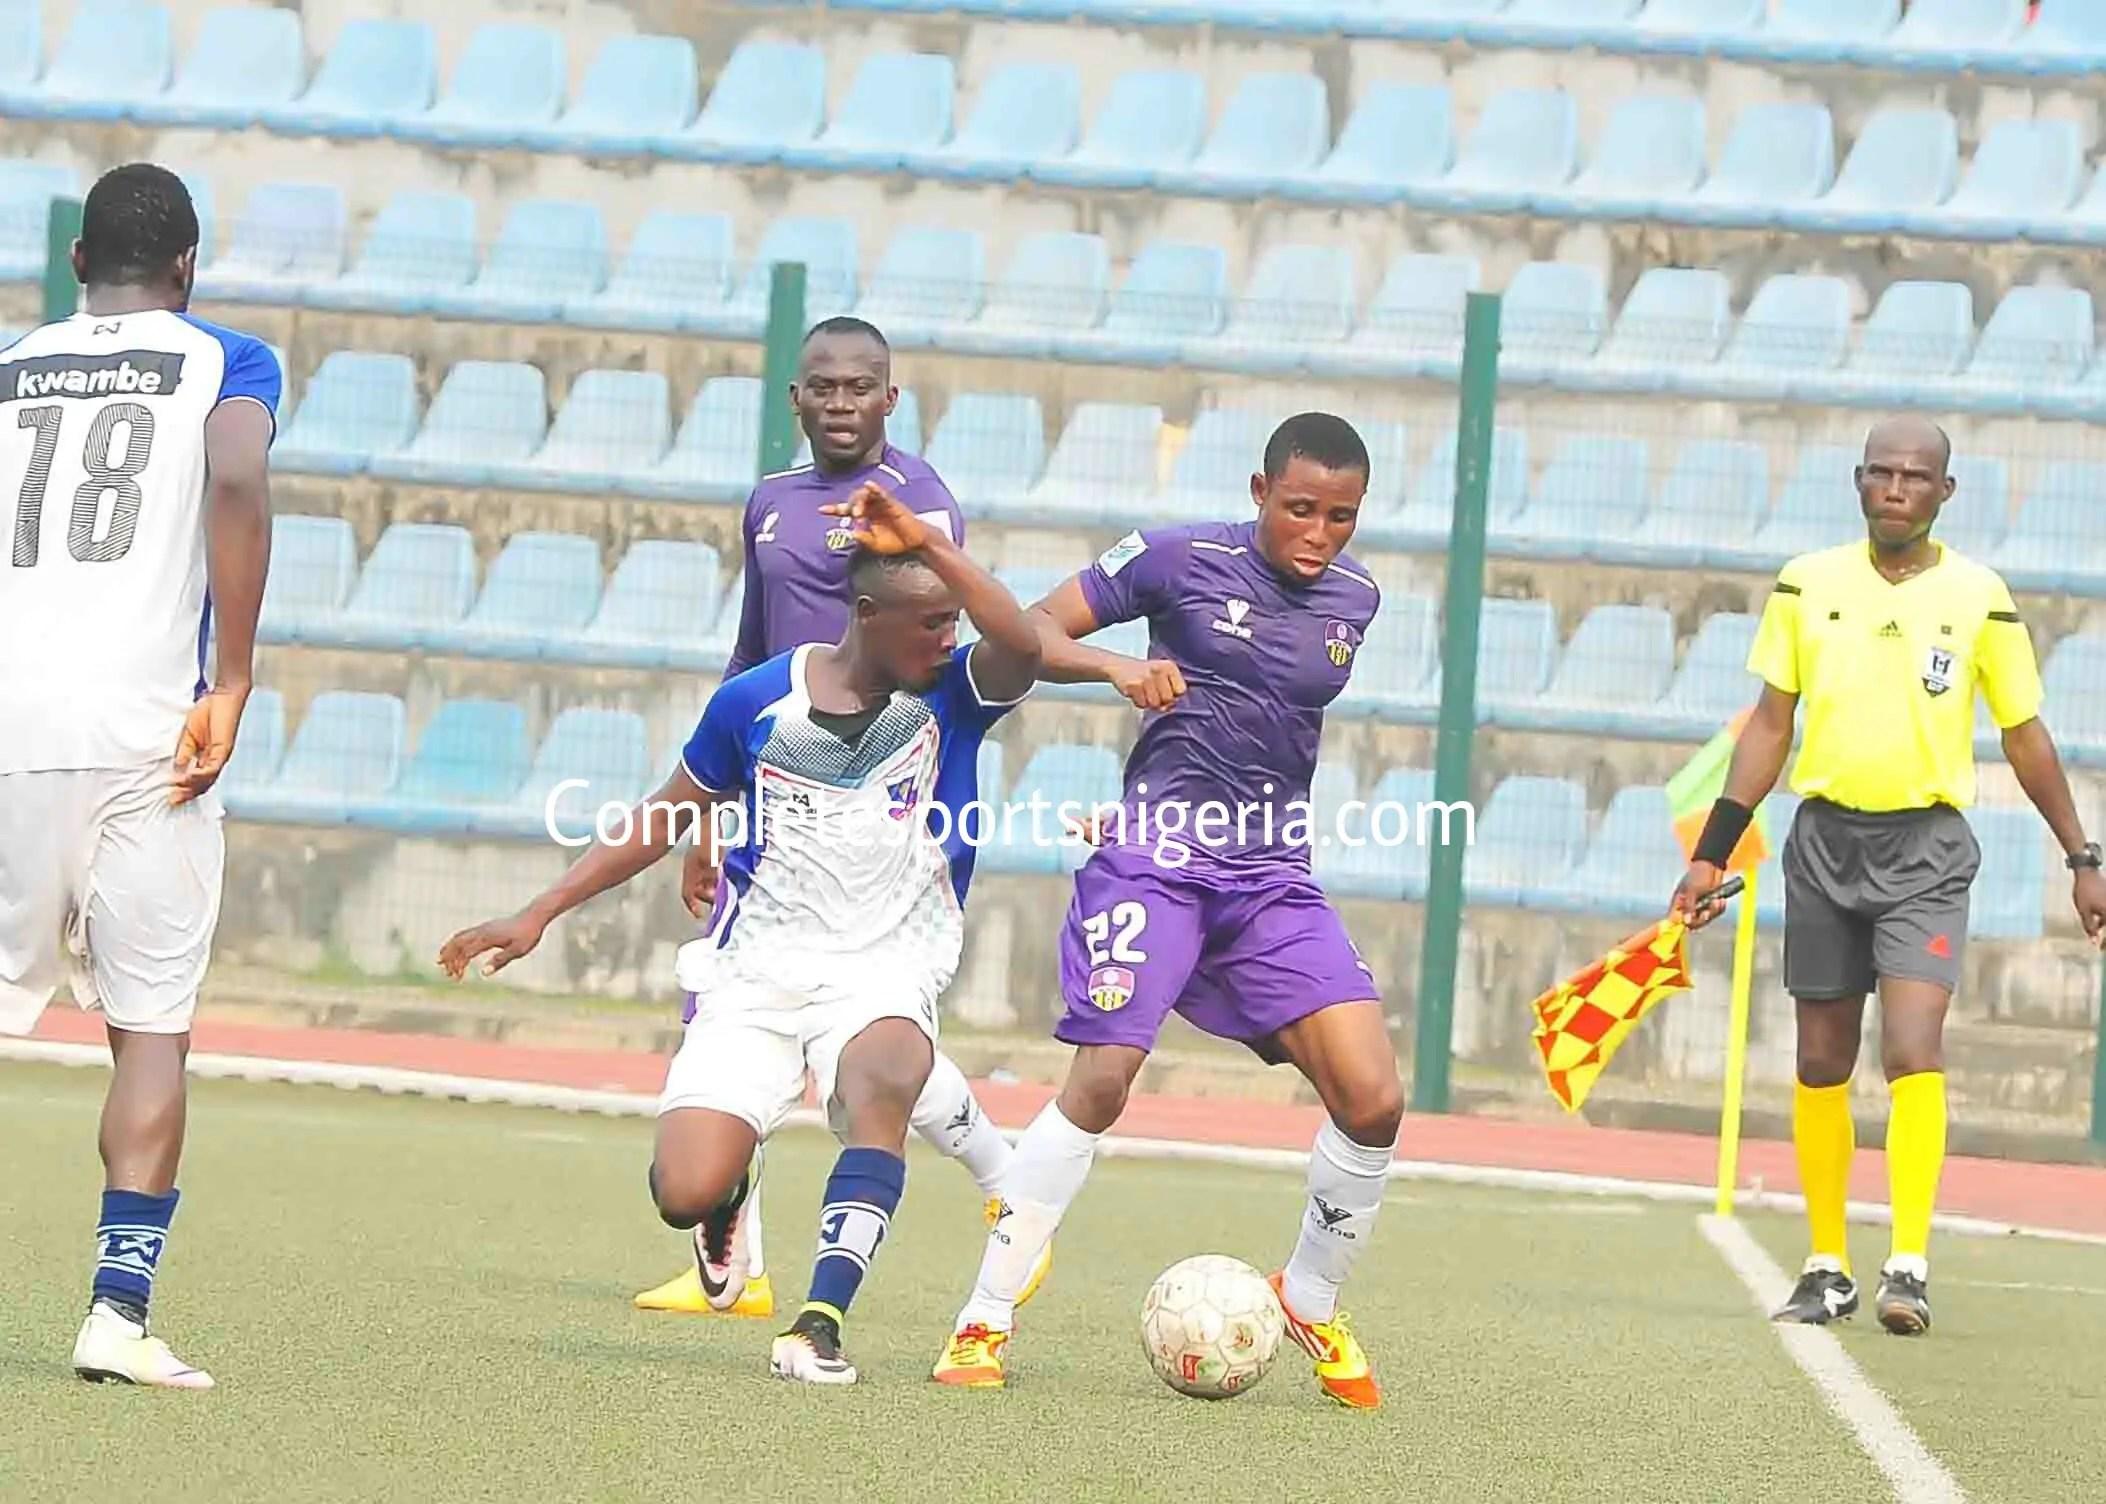 NPFL: MFM Close Gap On Leaders Plateau, 3SC Win; Enyimba, Rangers Lose